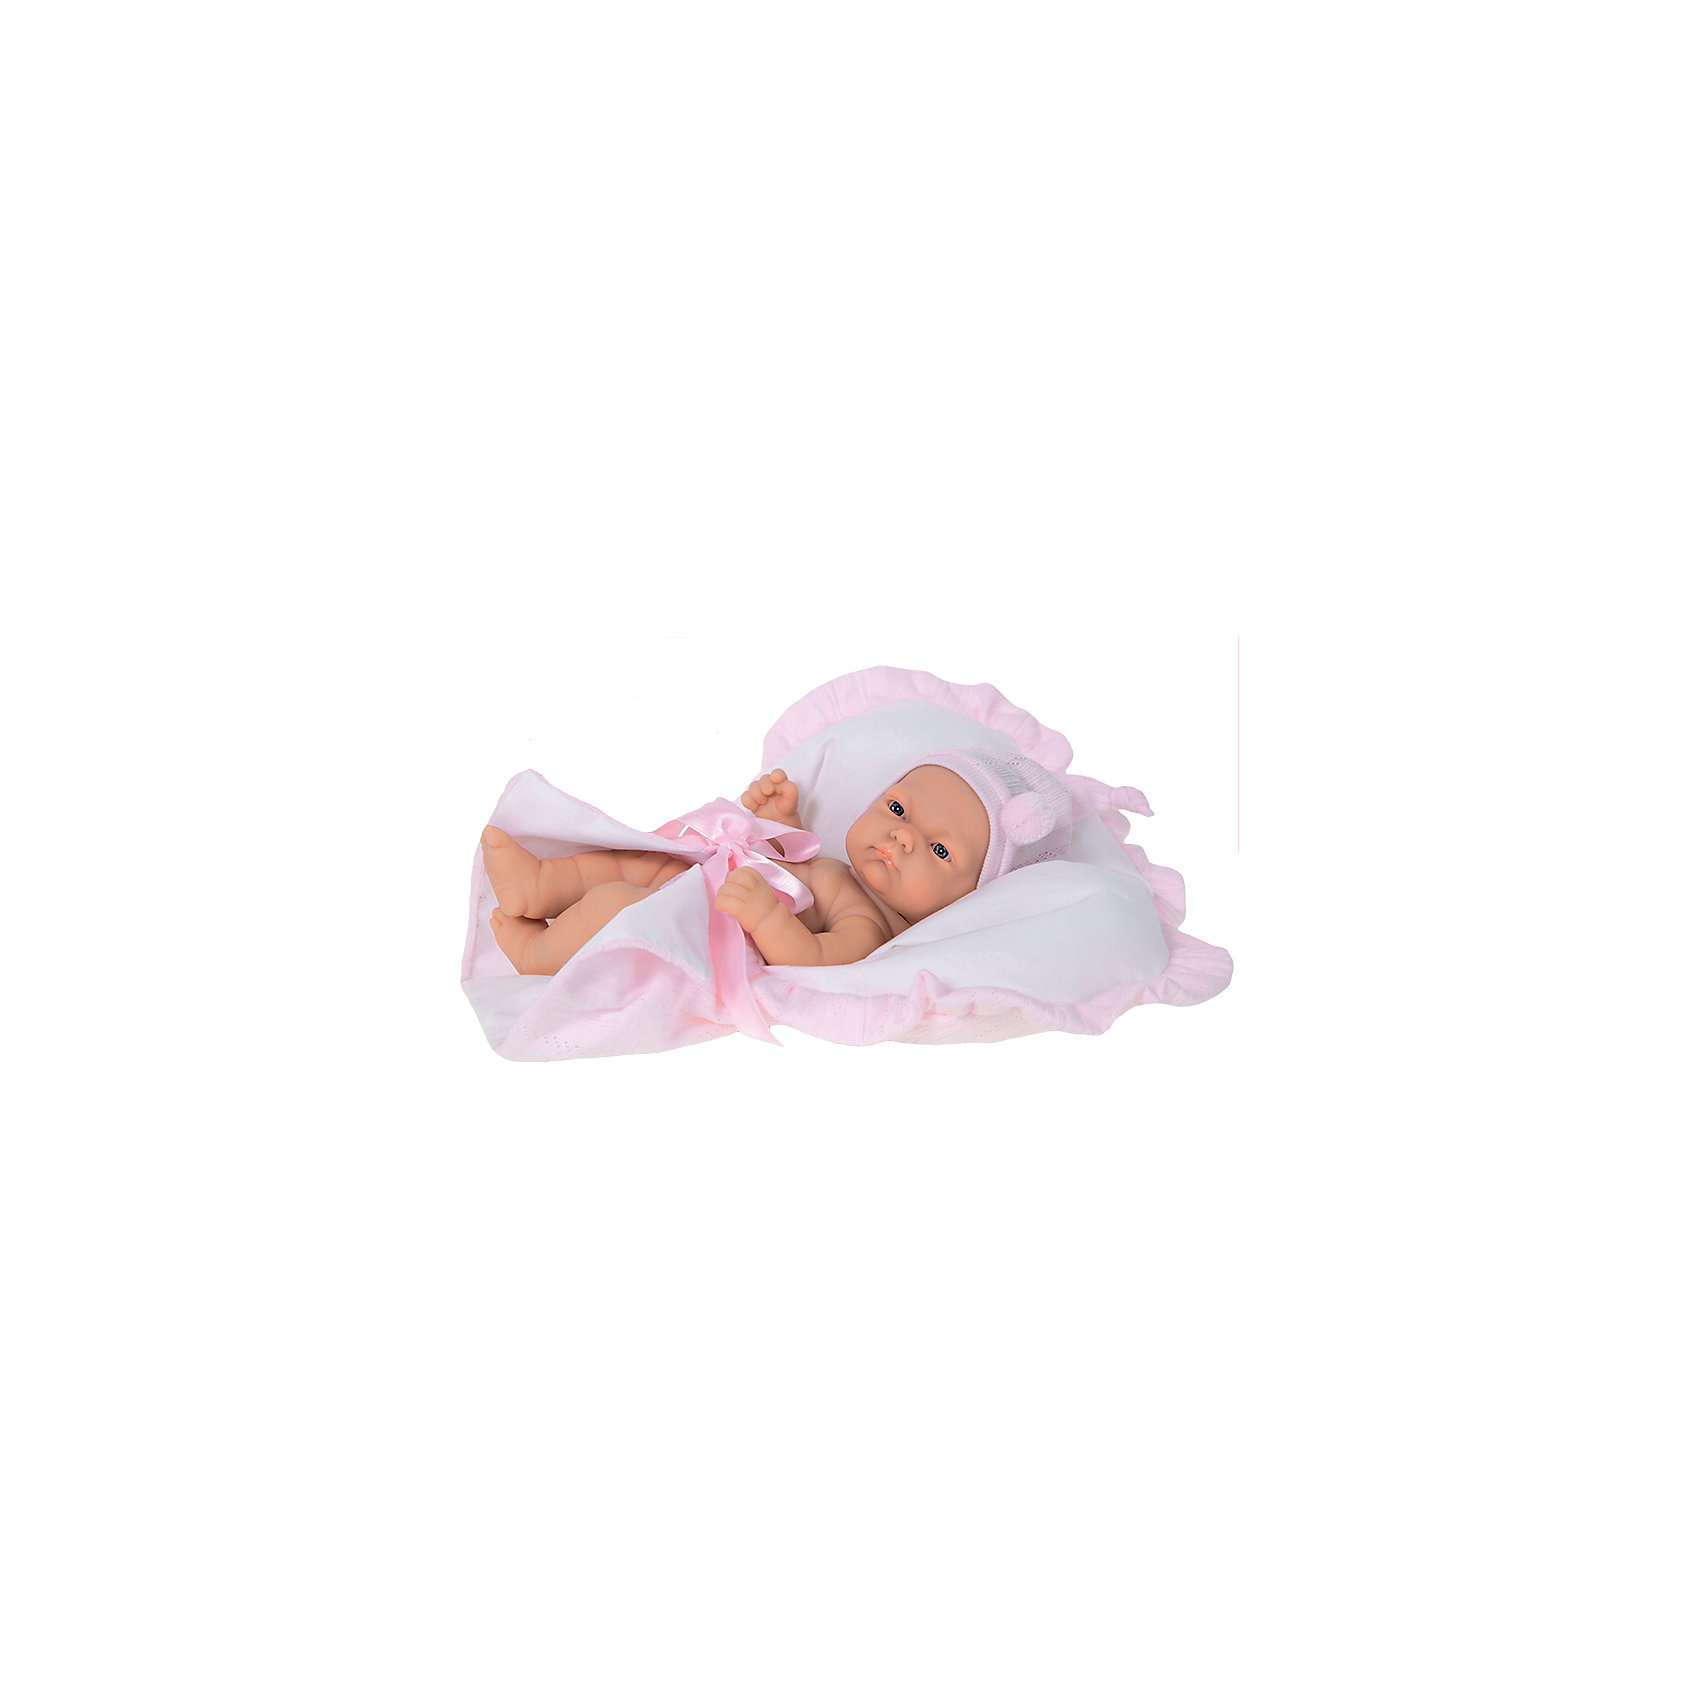 Munecas Antonio Juan Кукла-младенец Лея, 26 см, Munecas Antonio Juan munecas antonio juan кукла младенец карлос в конверте голубой 26 см munecas antonio juan